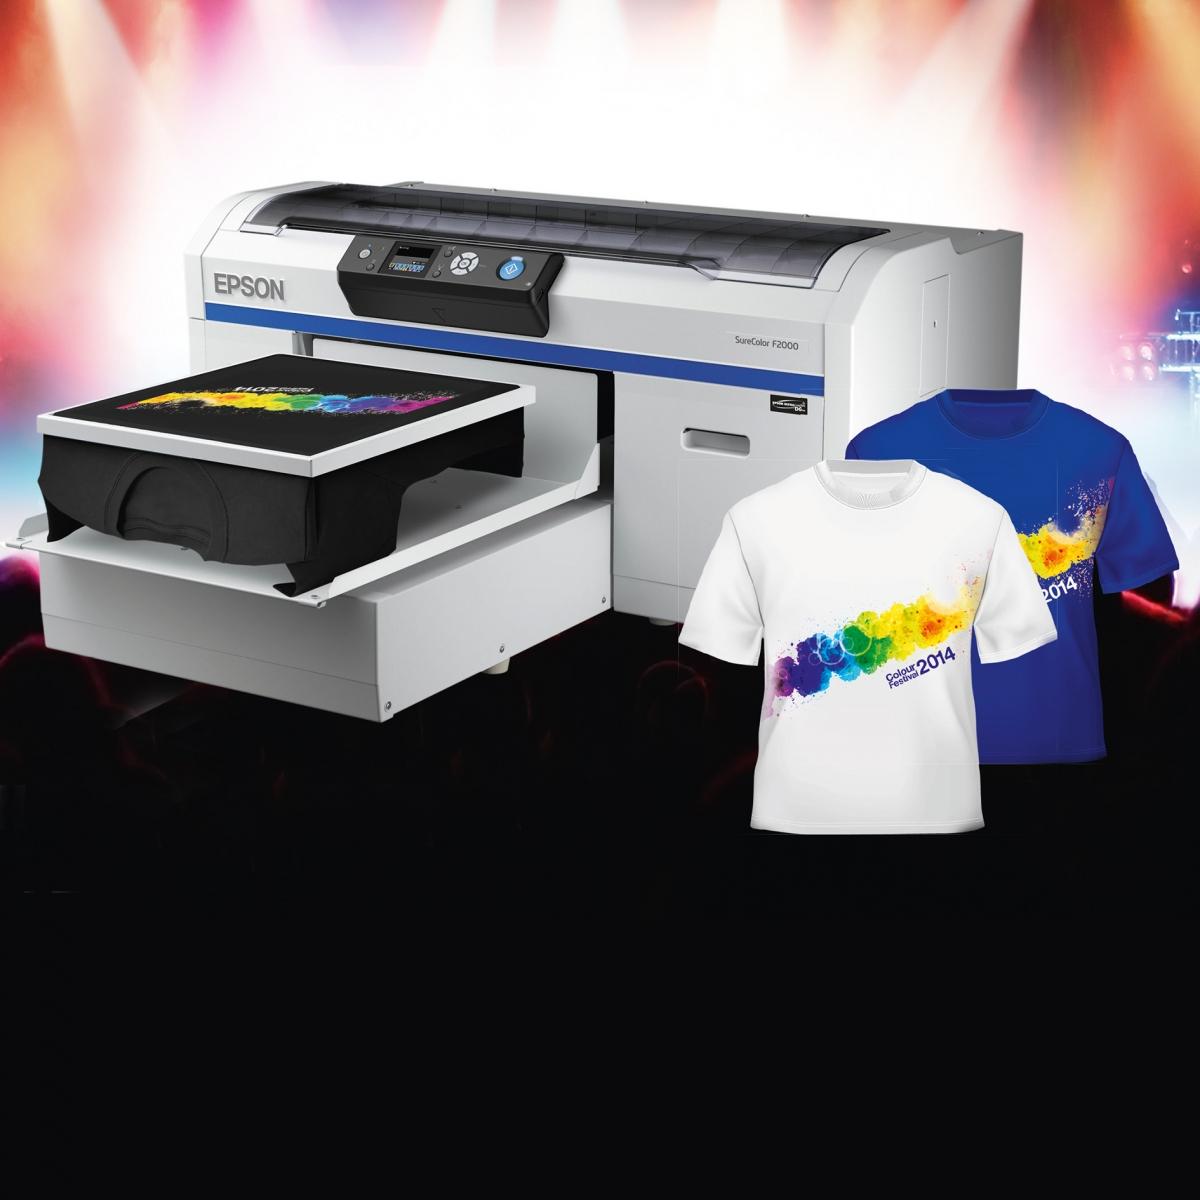 T-Shirt-Direktdruck - Copier Center Dortmund